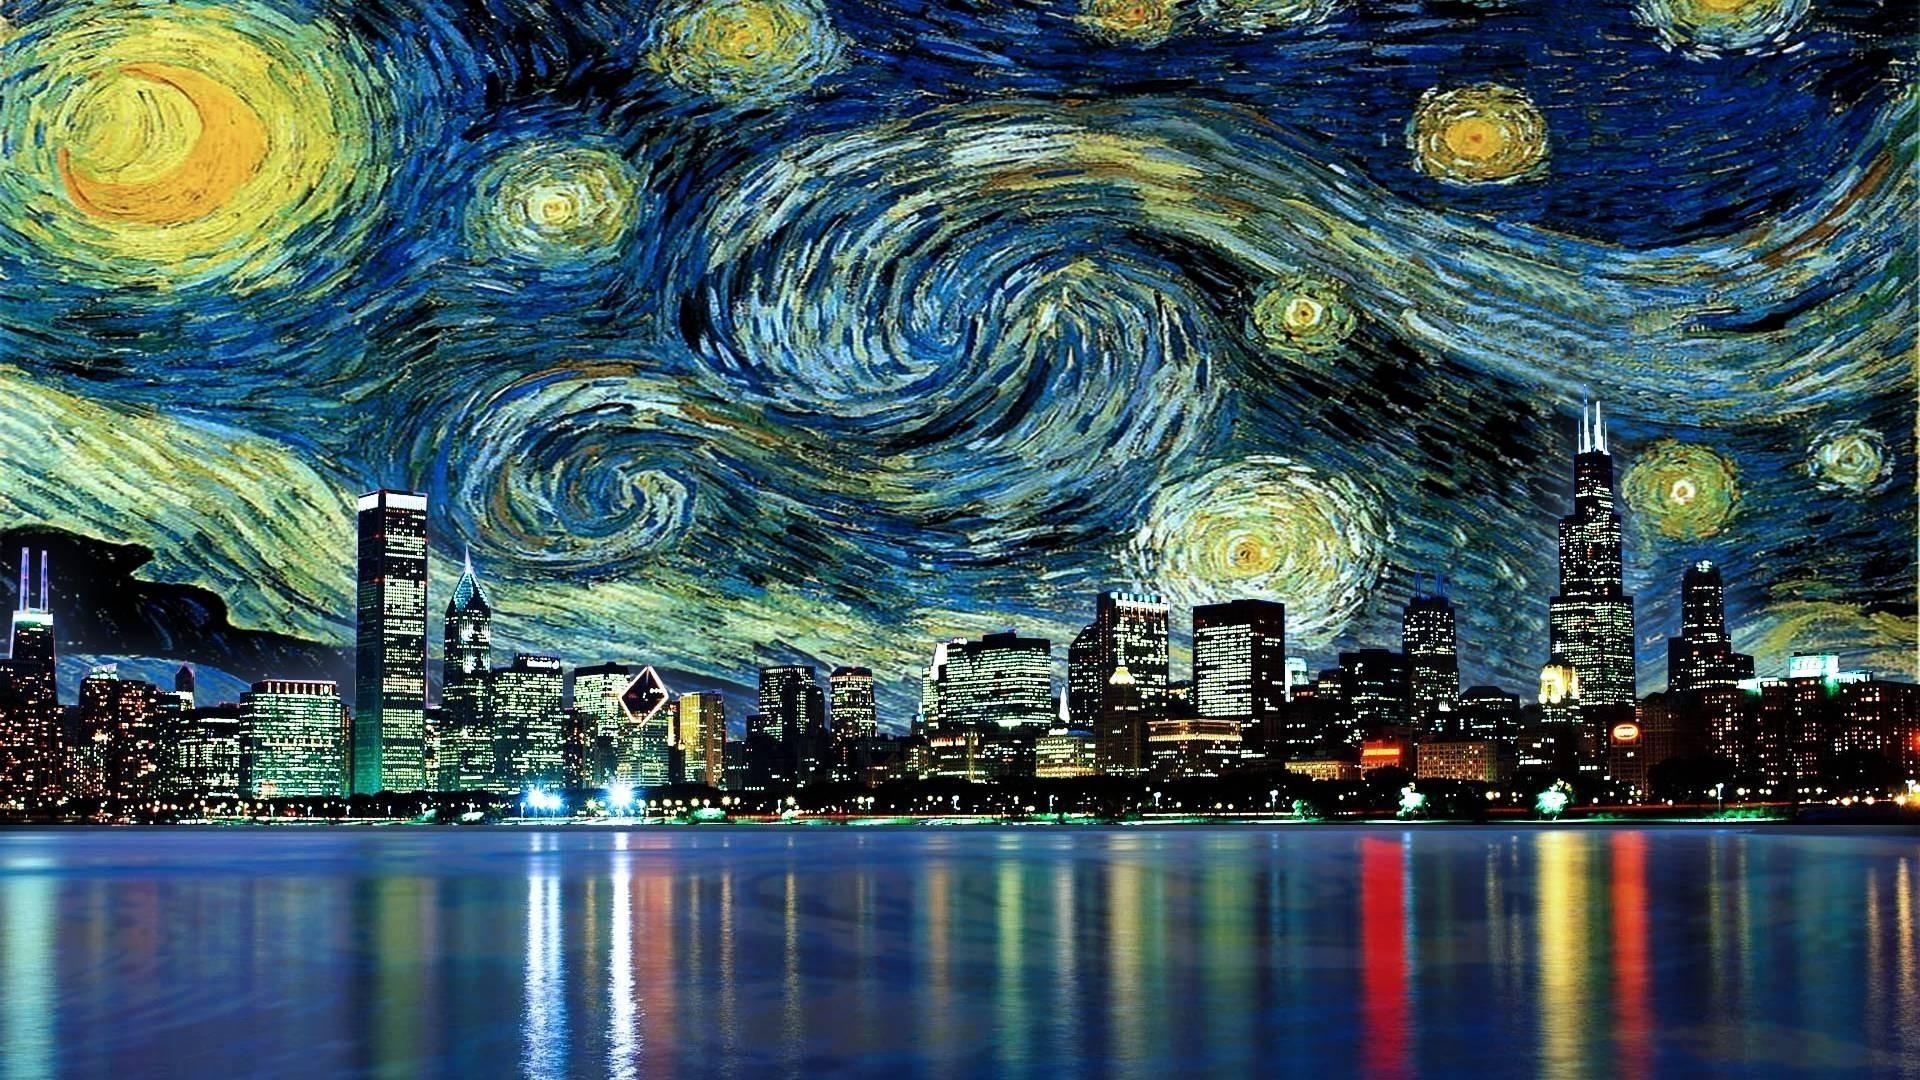 Res: 1920x1080, Van Gogh Wallpaper ① Free Amazing High Resolution